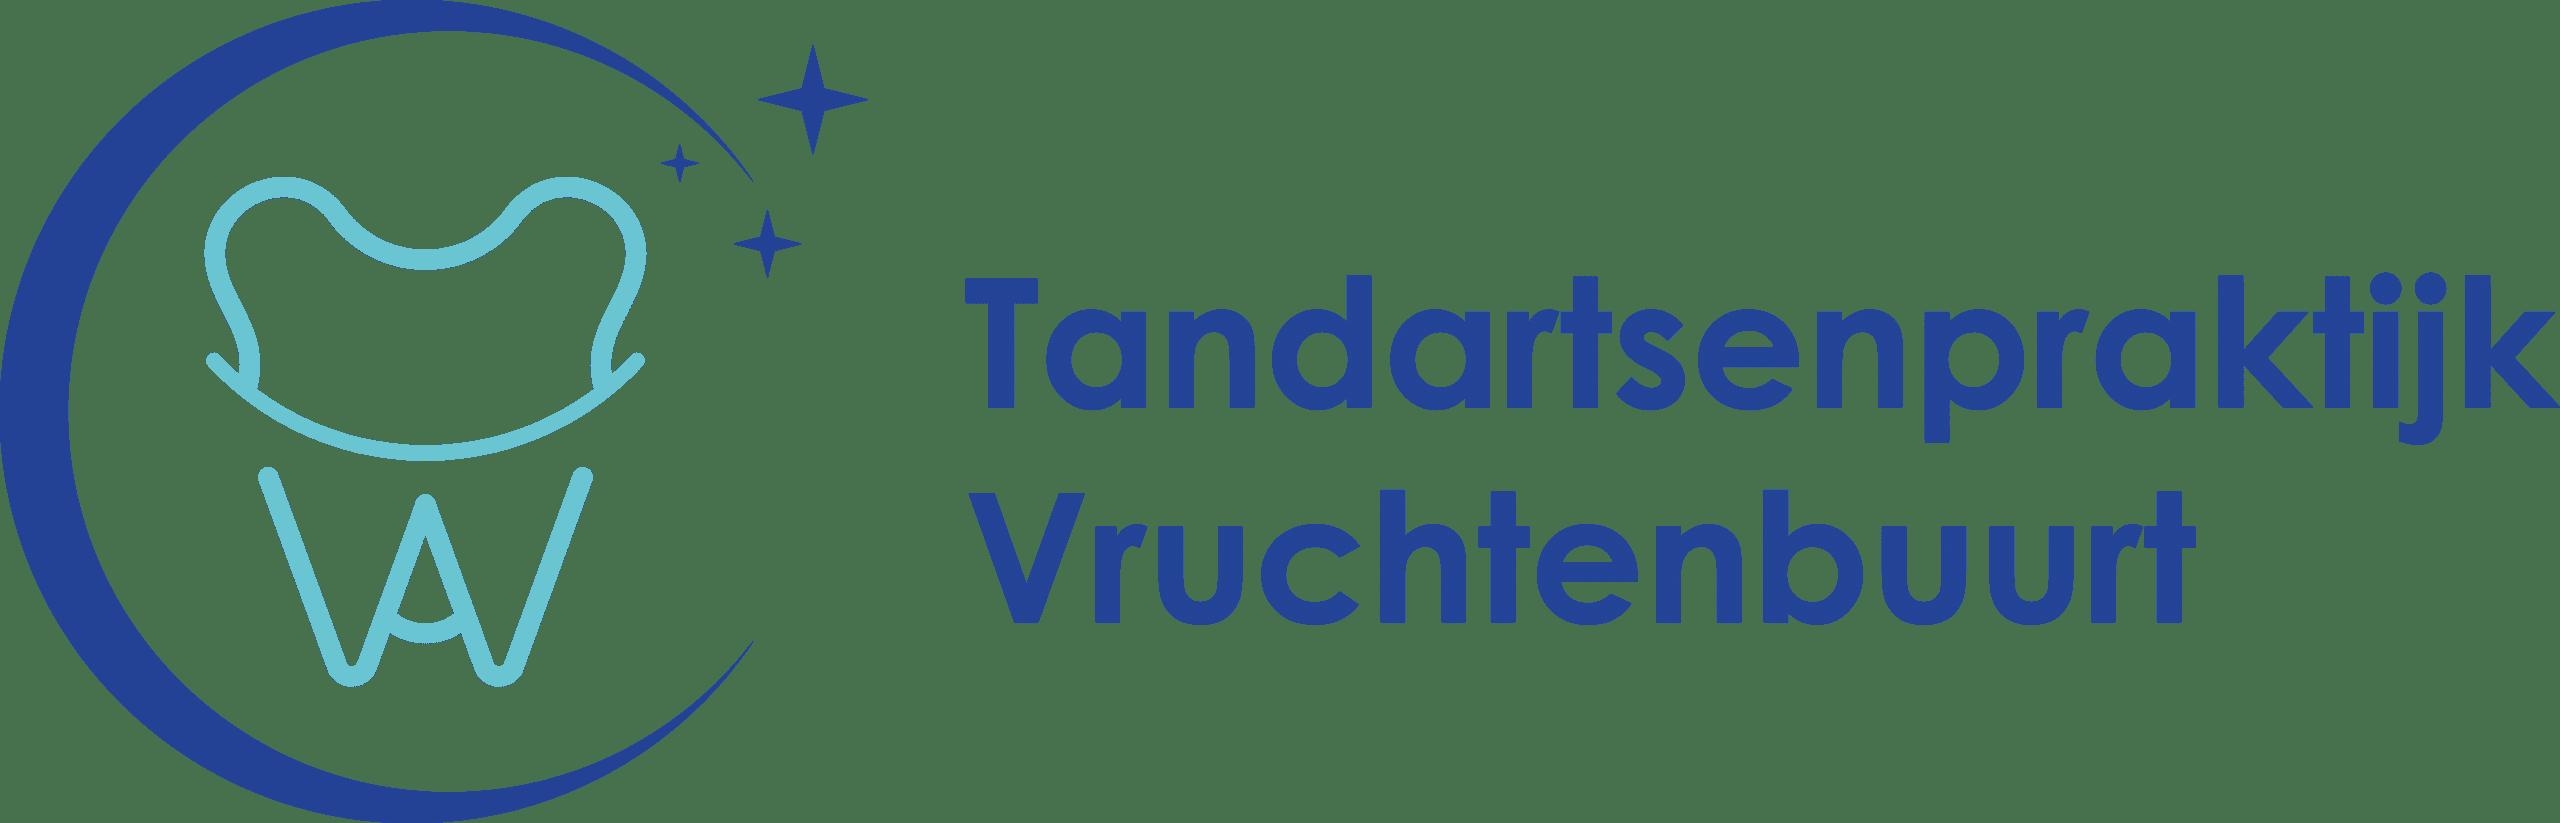 Logo Tandarts Vruchtenbuurt